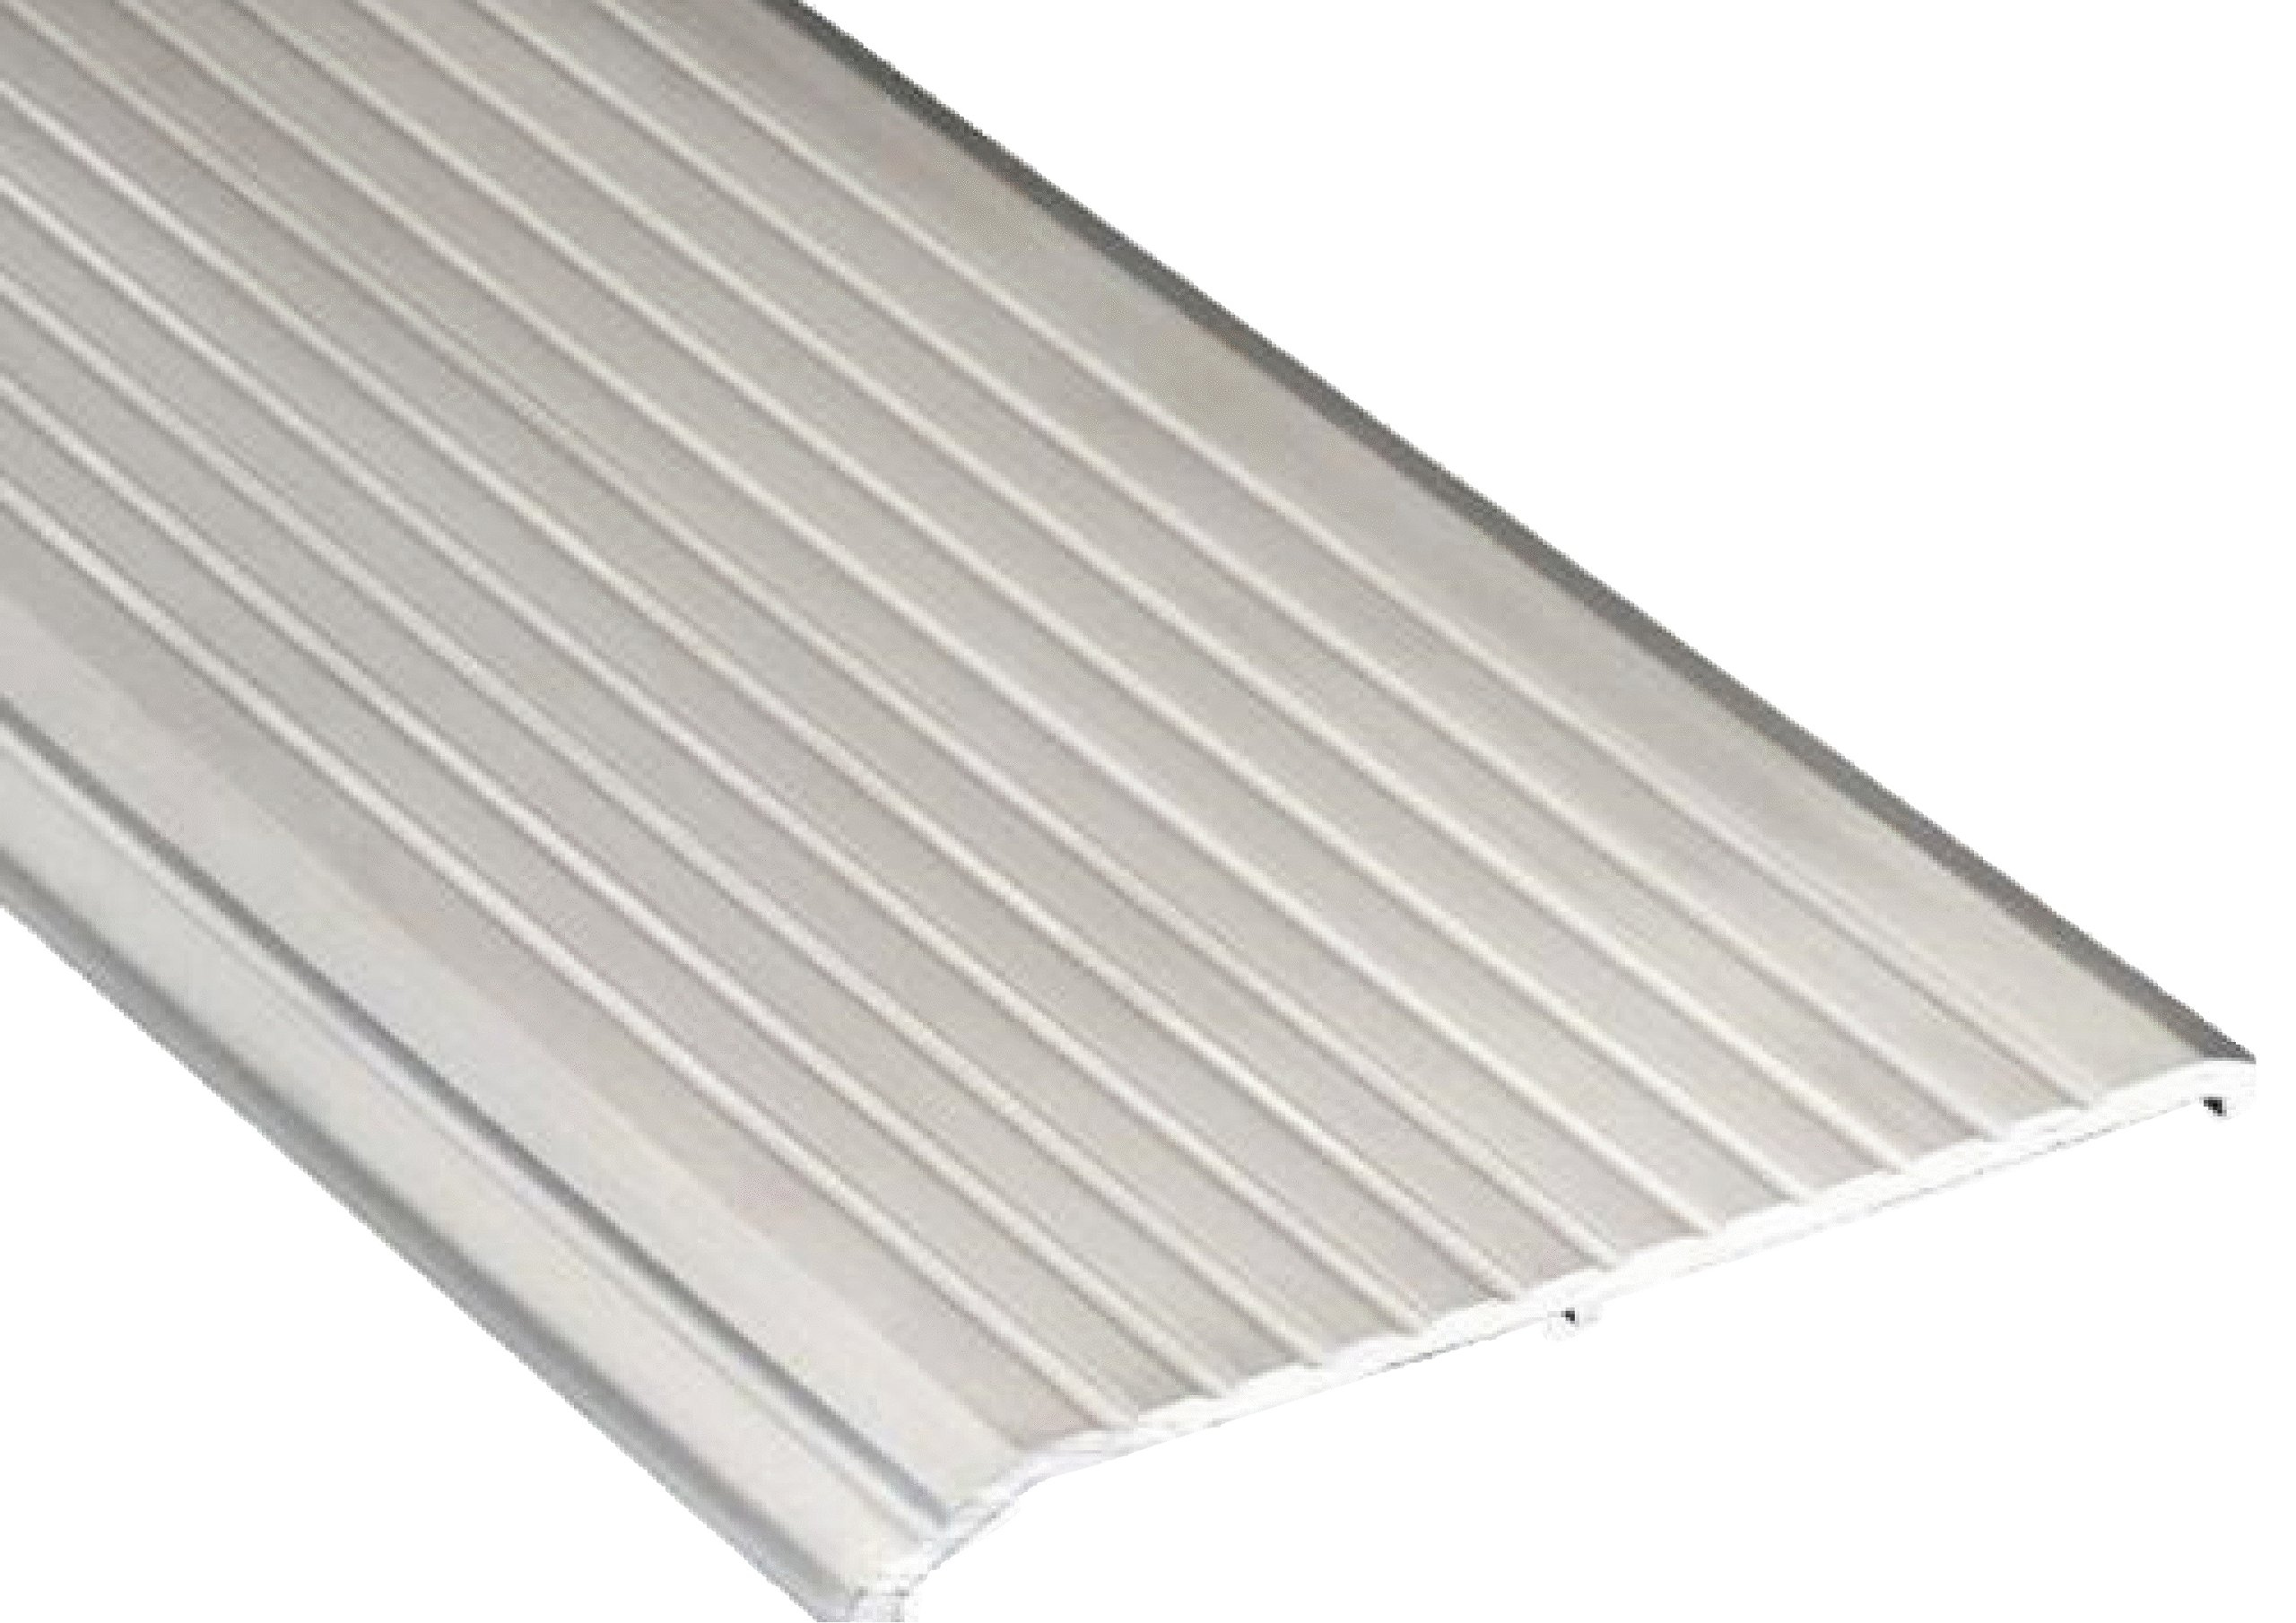 Pemko 085616 2748A36 Saddle Threshold, Mill Finish Aluminum, 8'' width, 36'' Length, Aluminum